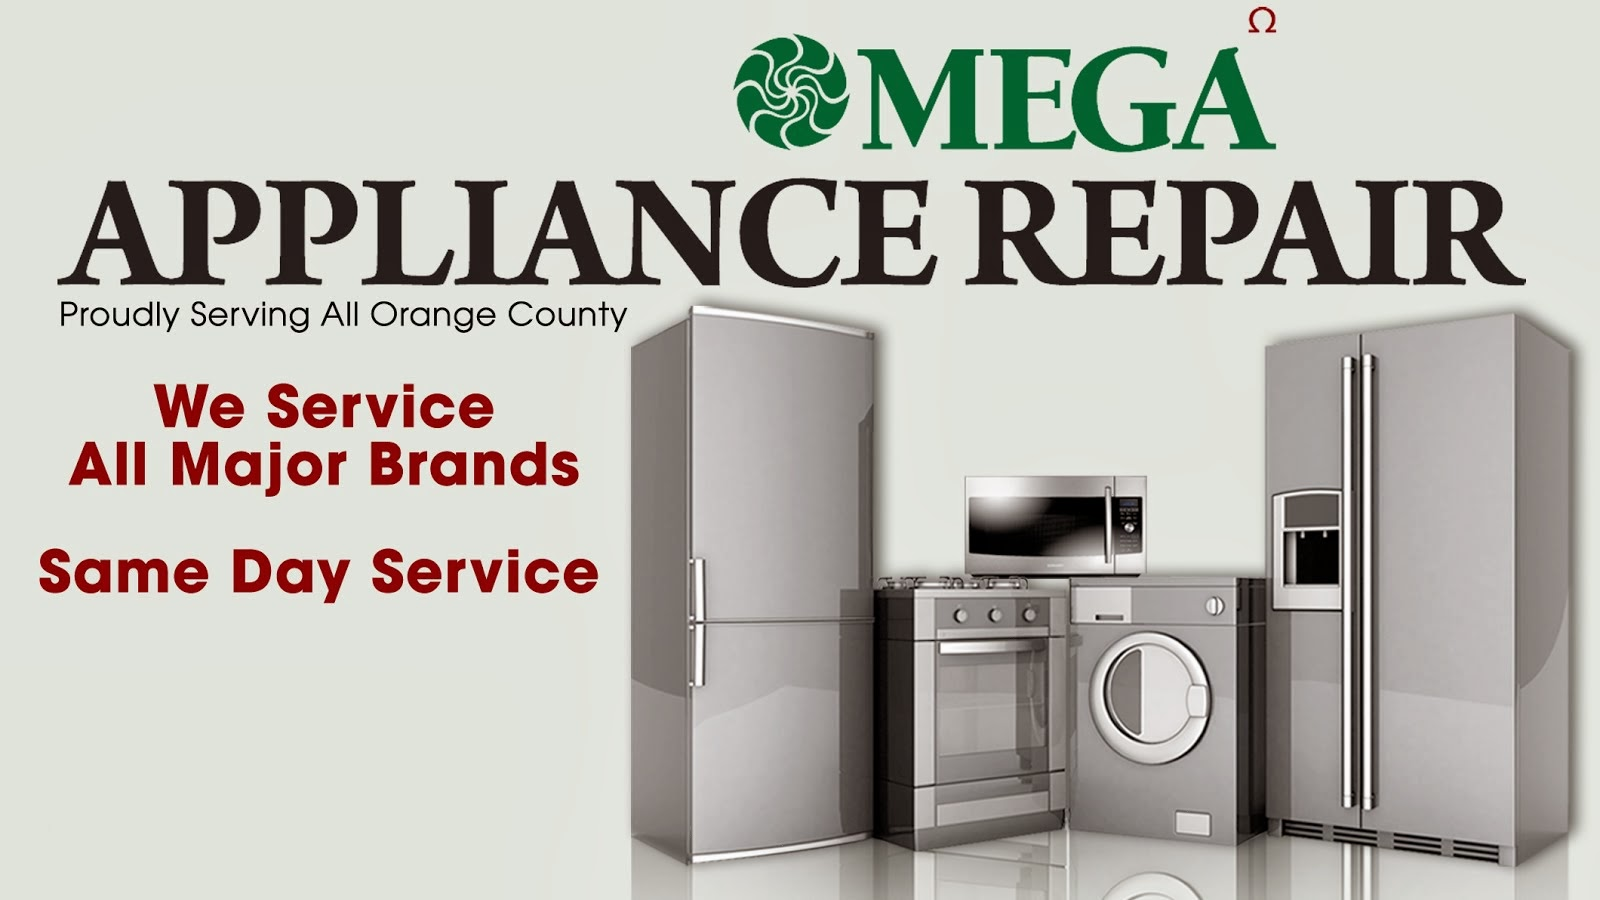 Omega Appliance Repair 800 545 5618